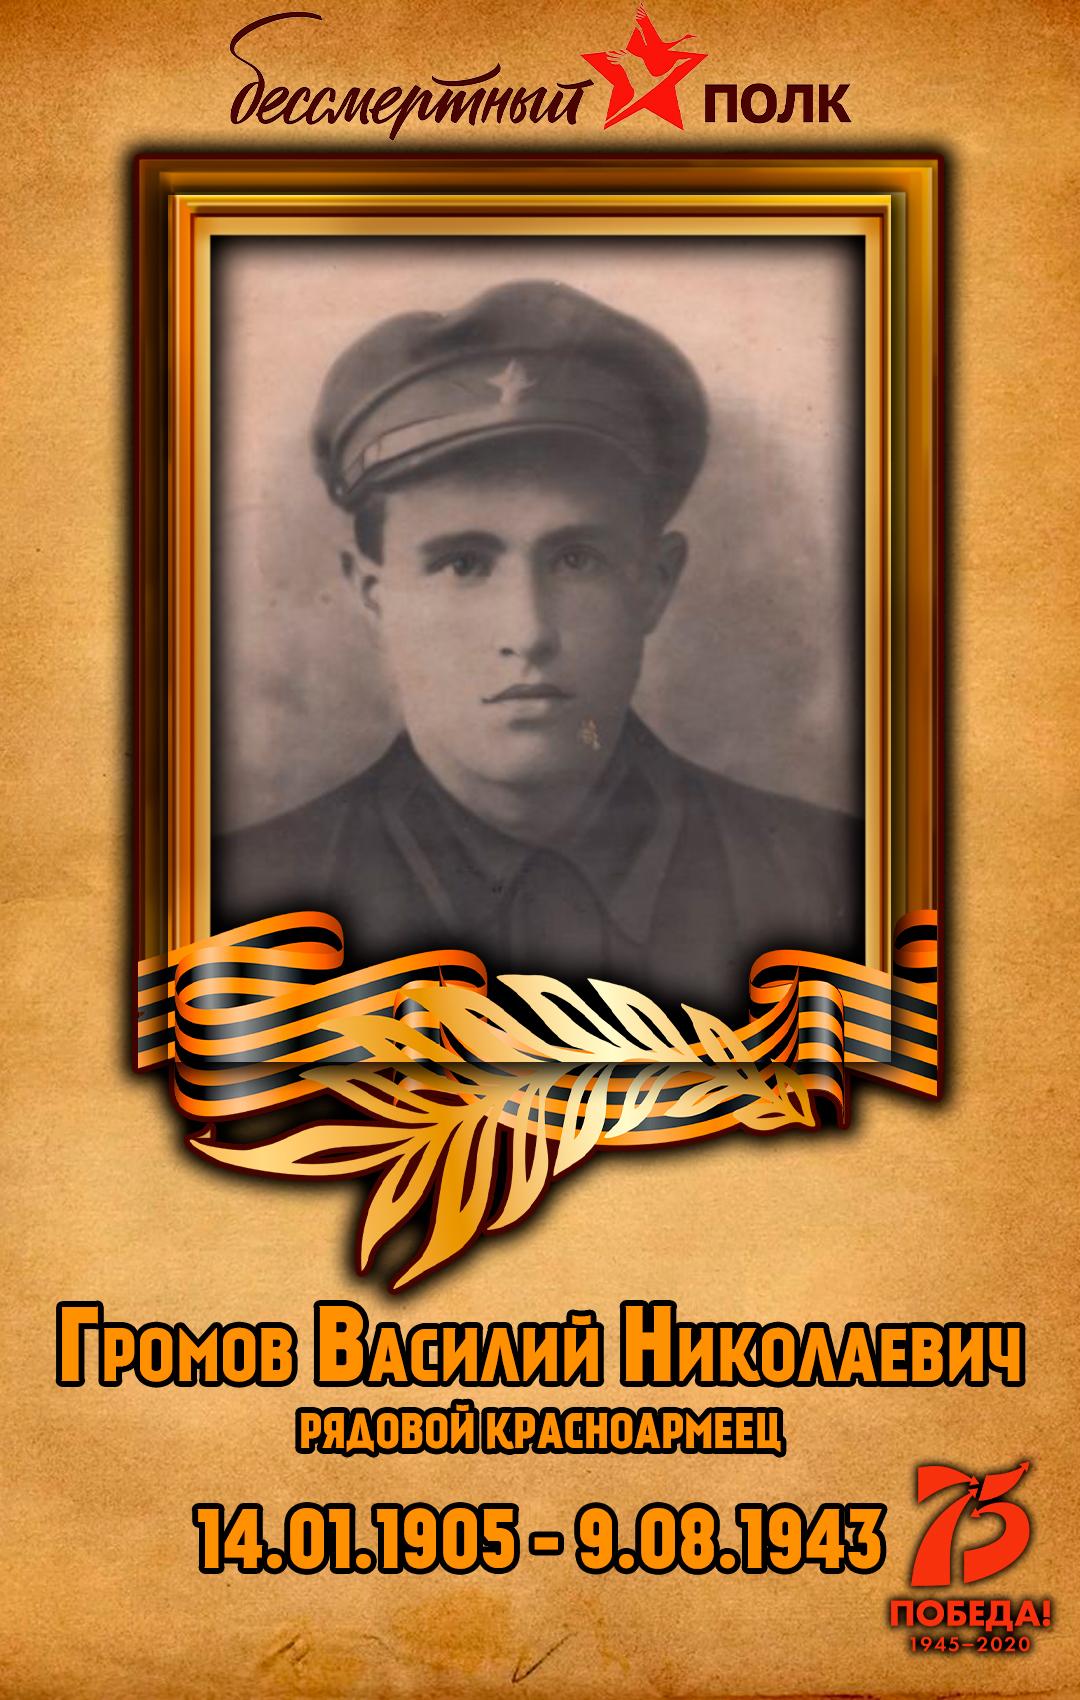 Громов-Василий-Николаевич